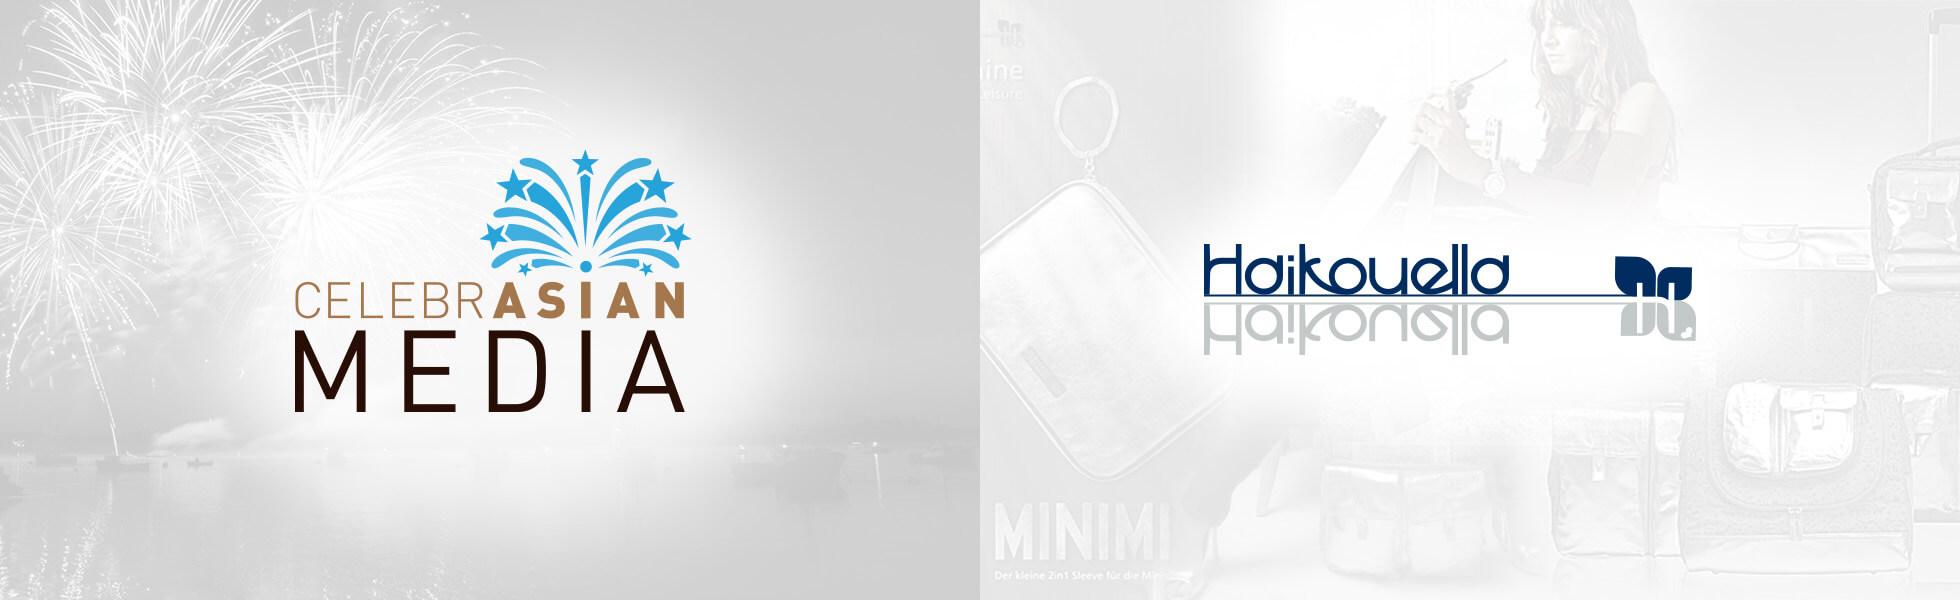 Logo Design Muenchen Corporated Design Brand T Ultimatelogos V7